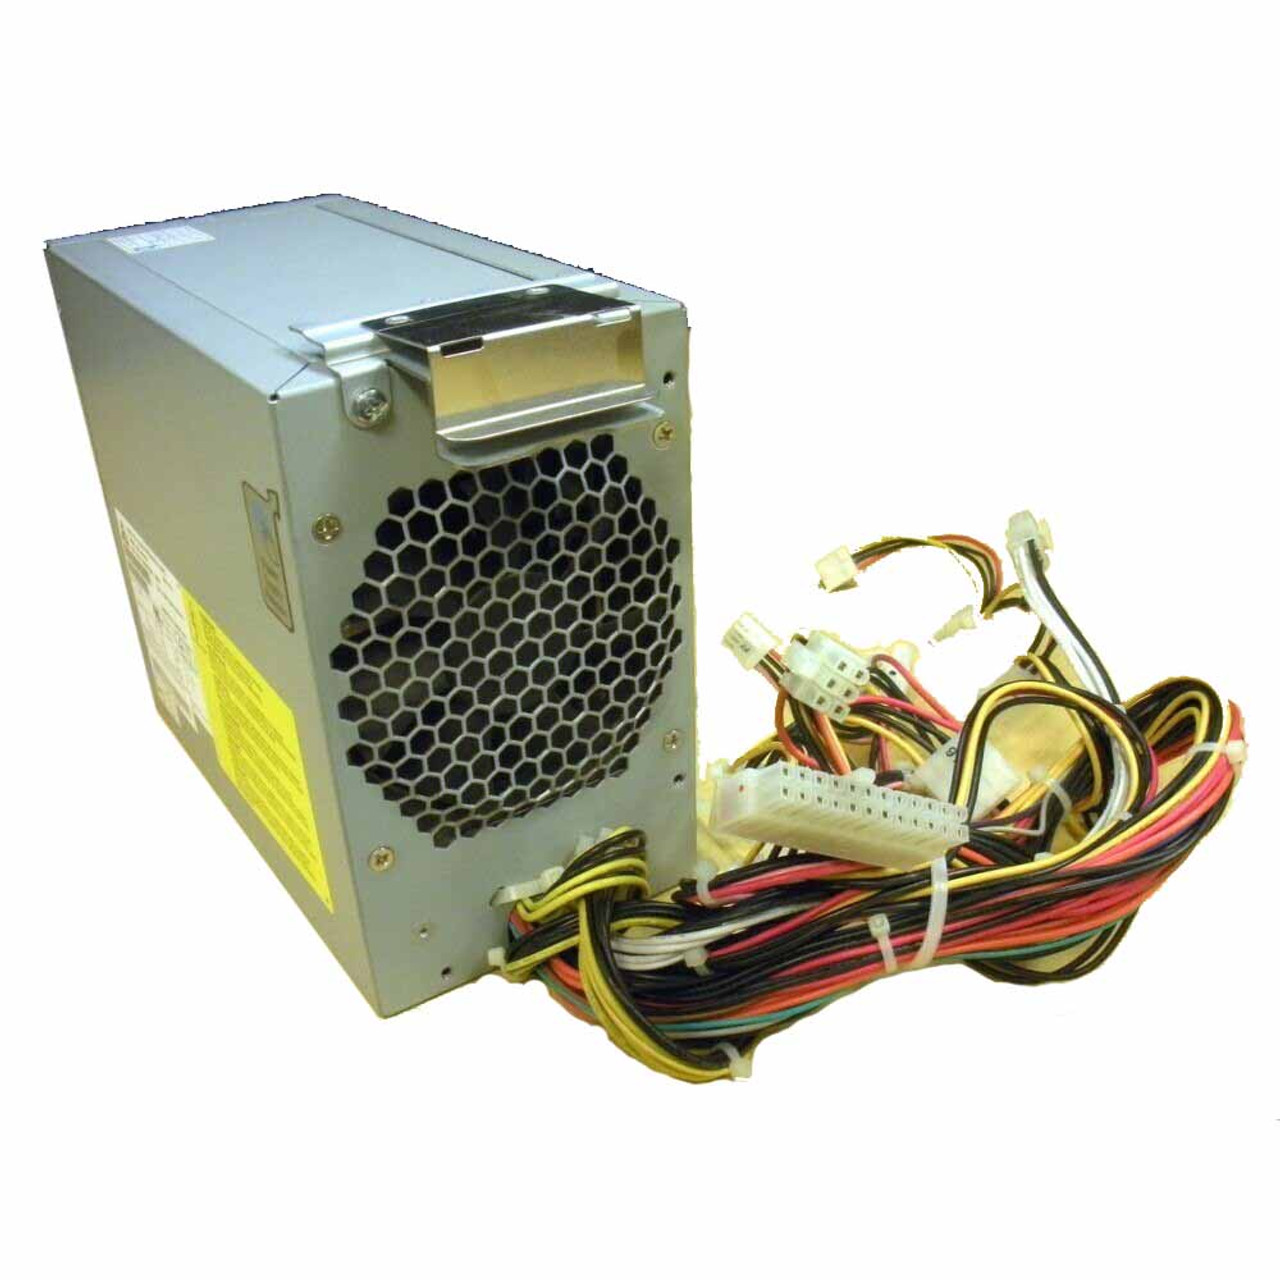 0957-2092 Hew 0957-2092 Hewlett-Packard Power Supply For C8000 P//N